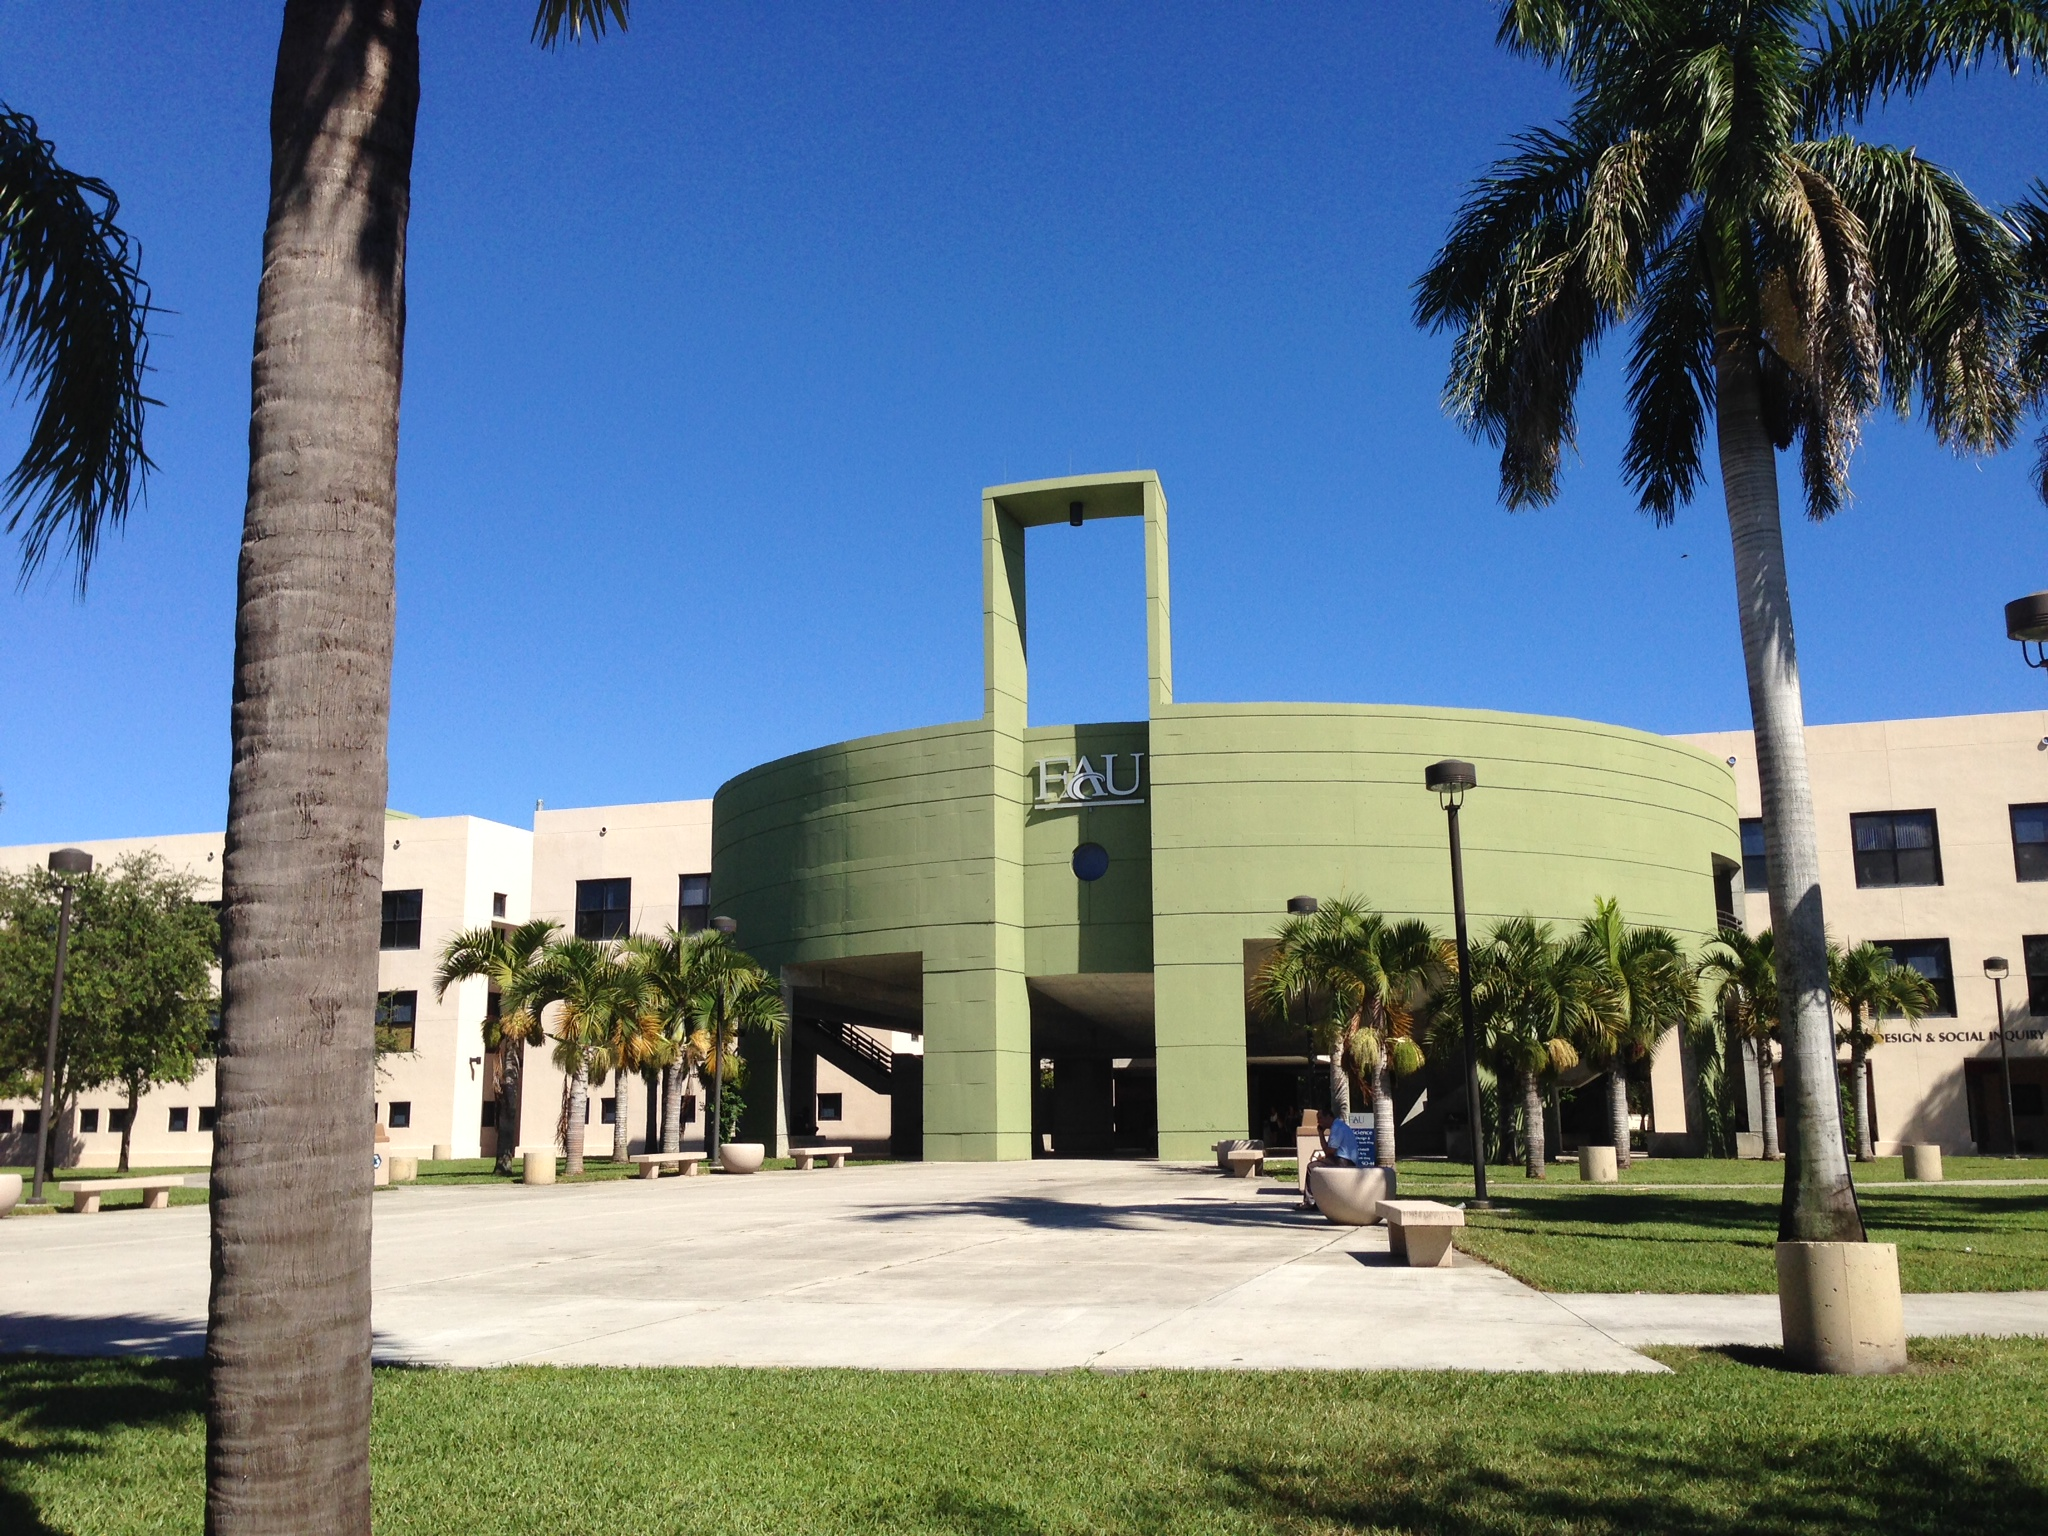 University Hospital West Palm Beach